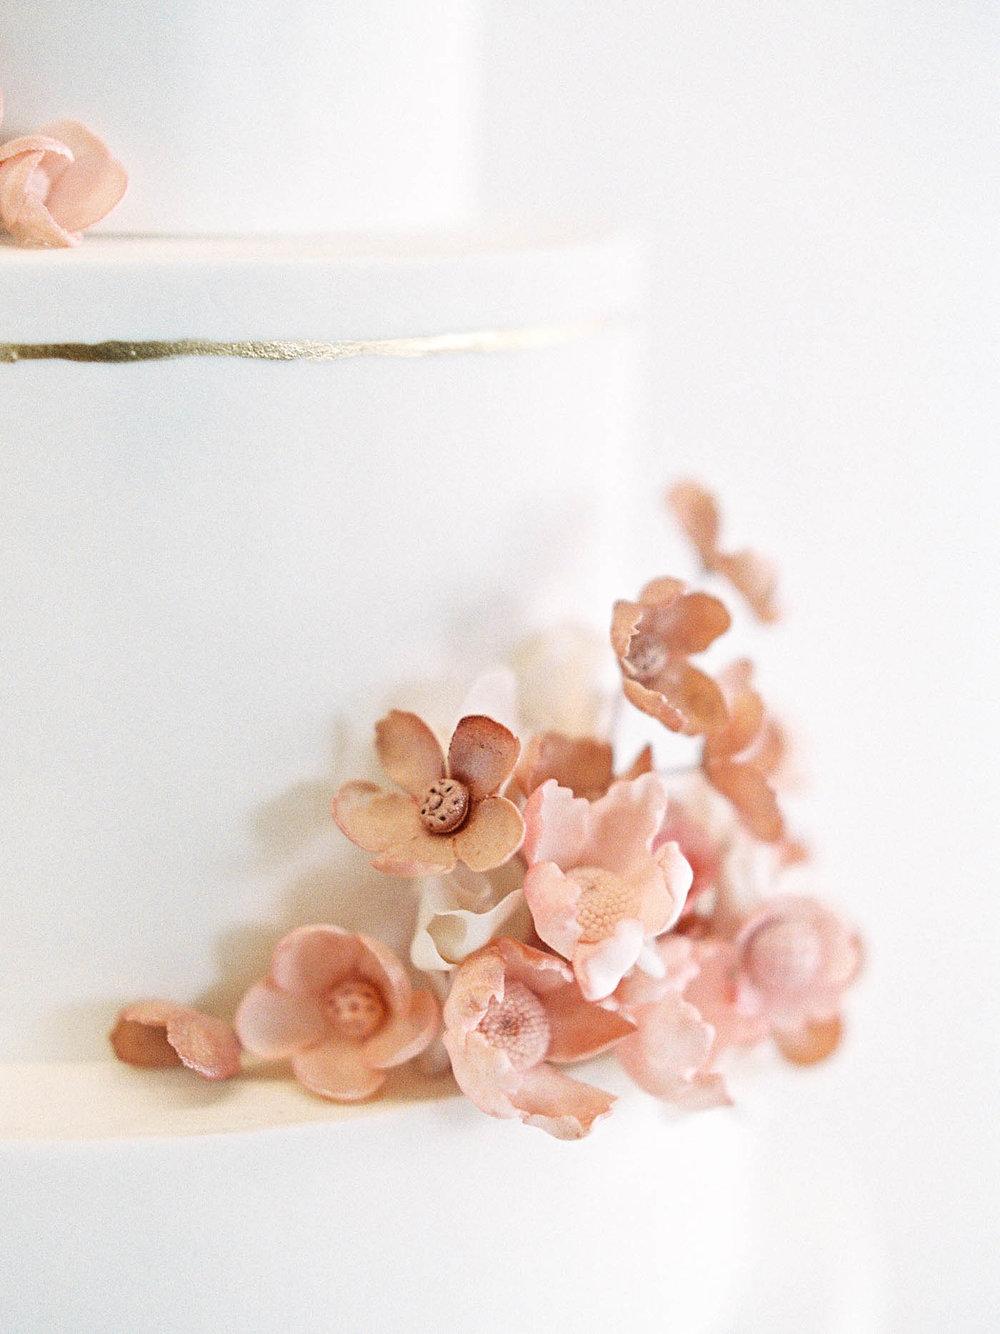 Delicate-Wedding-Cakes-5-Jen_Huang-002343-R1-025.jpg